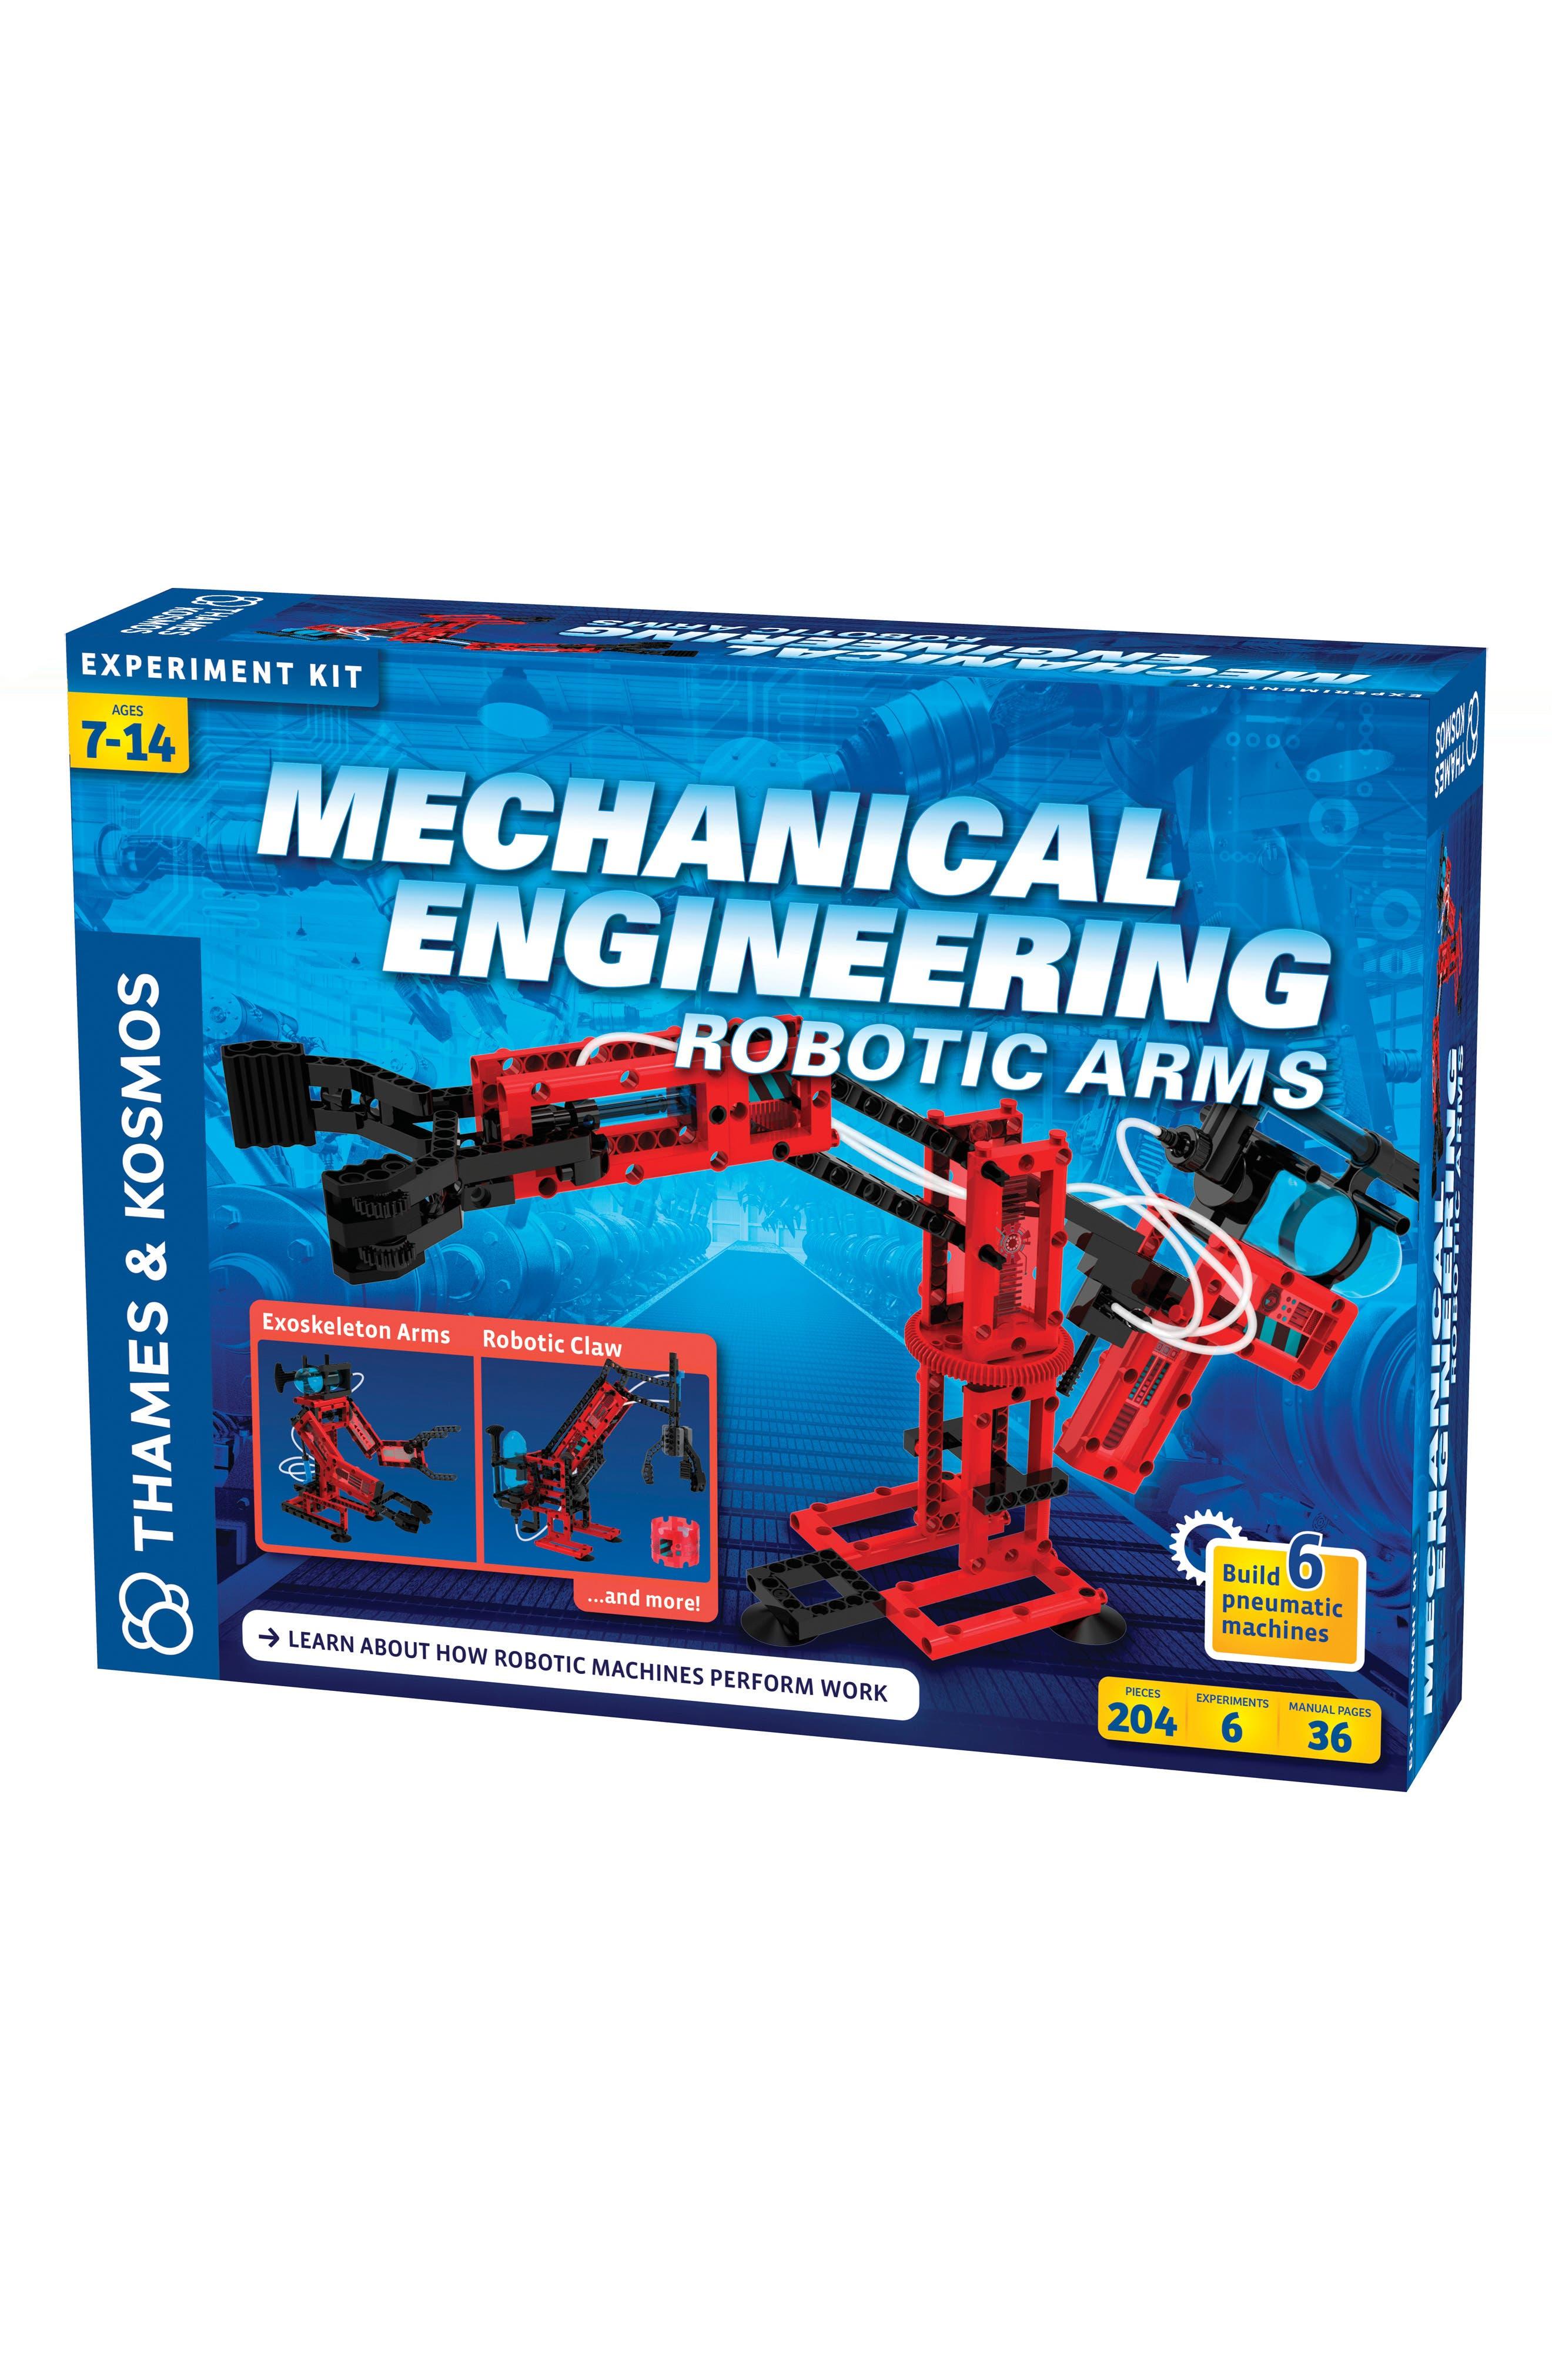 Mechanical Engineering Robotic Arms Kit,                             Main thumbnail 1, color,                             Multi